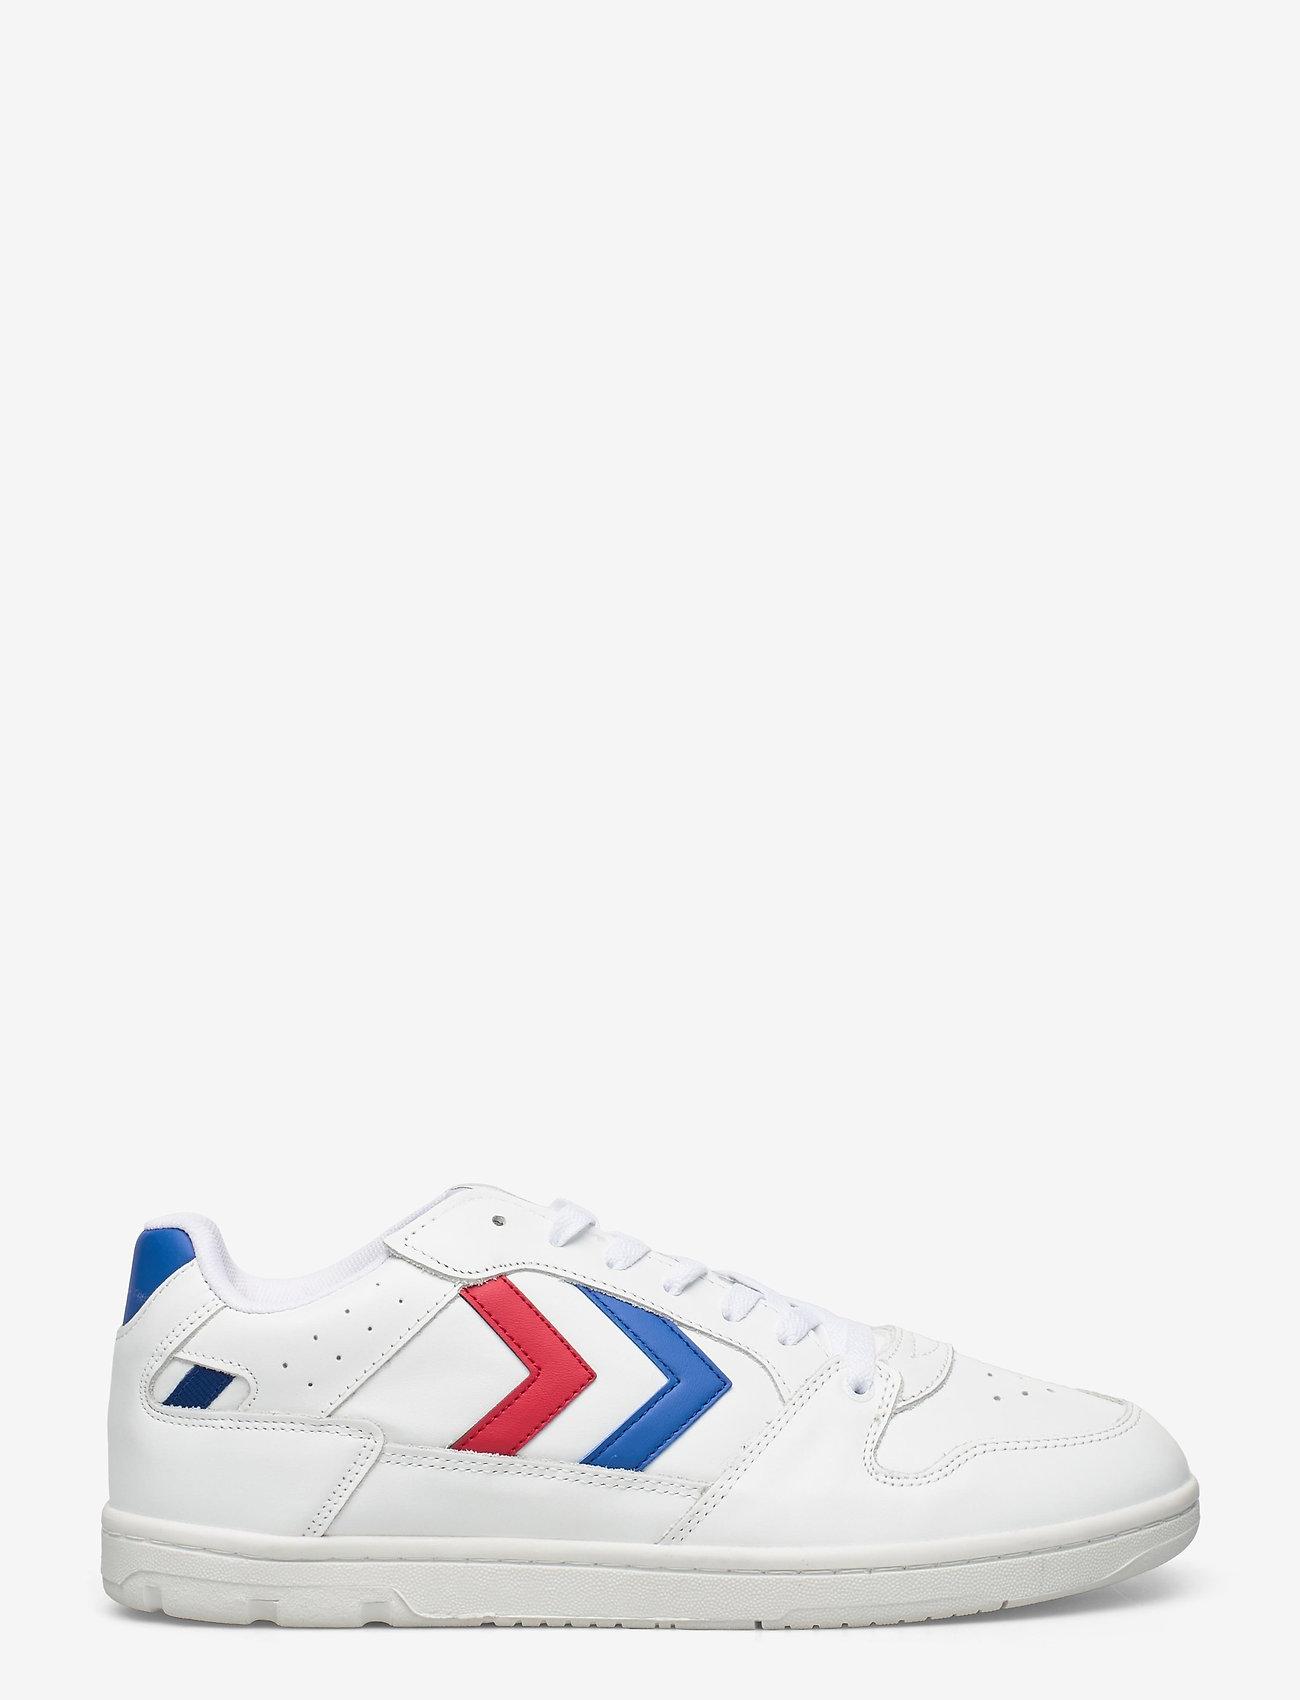 Hummel - POWER PLAY OGC - laag sneakers - white - 0